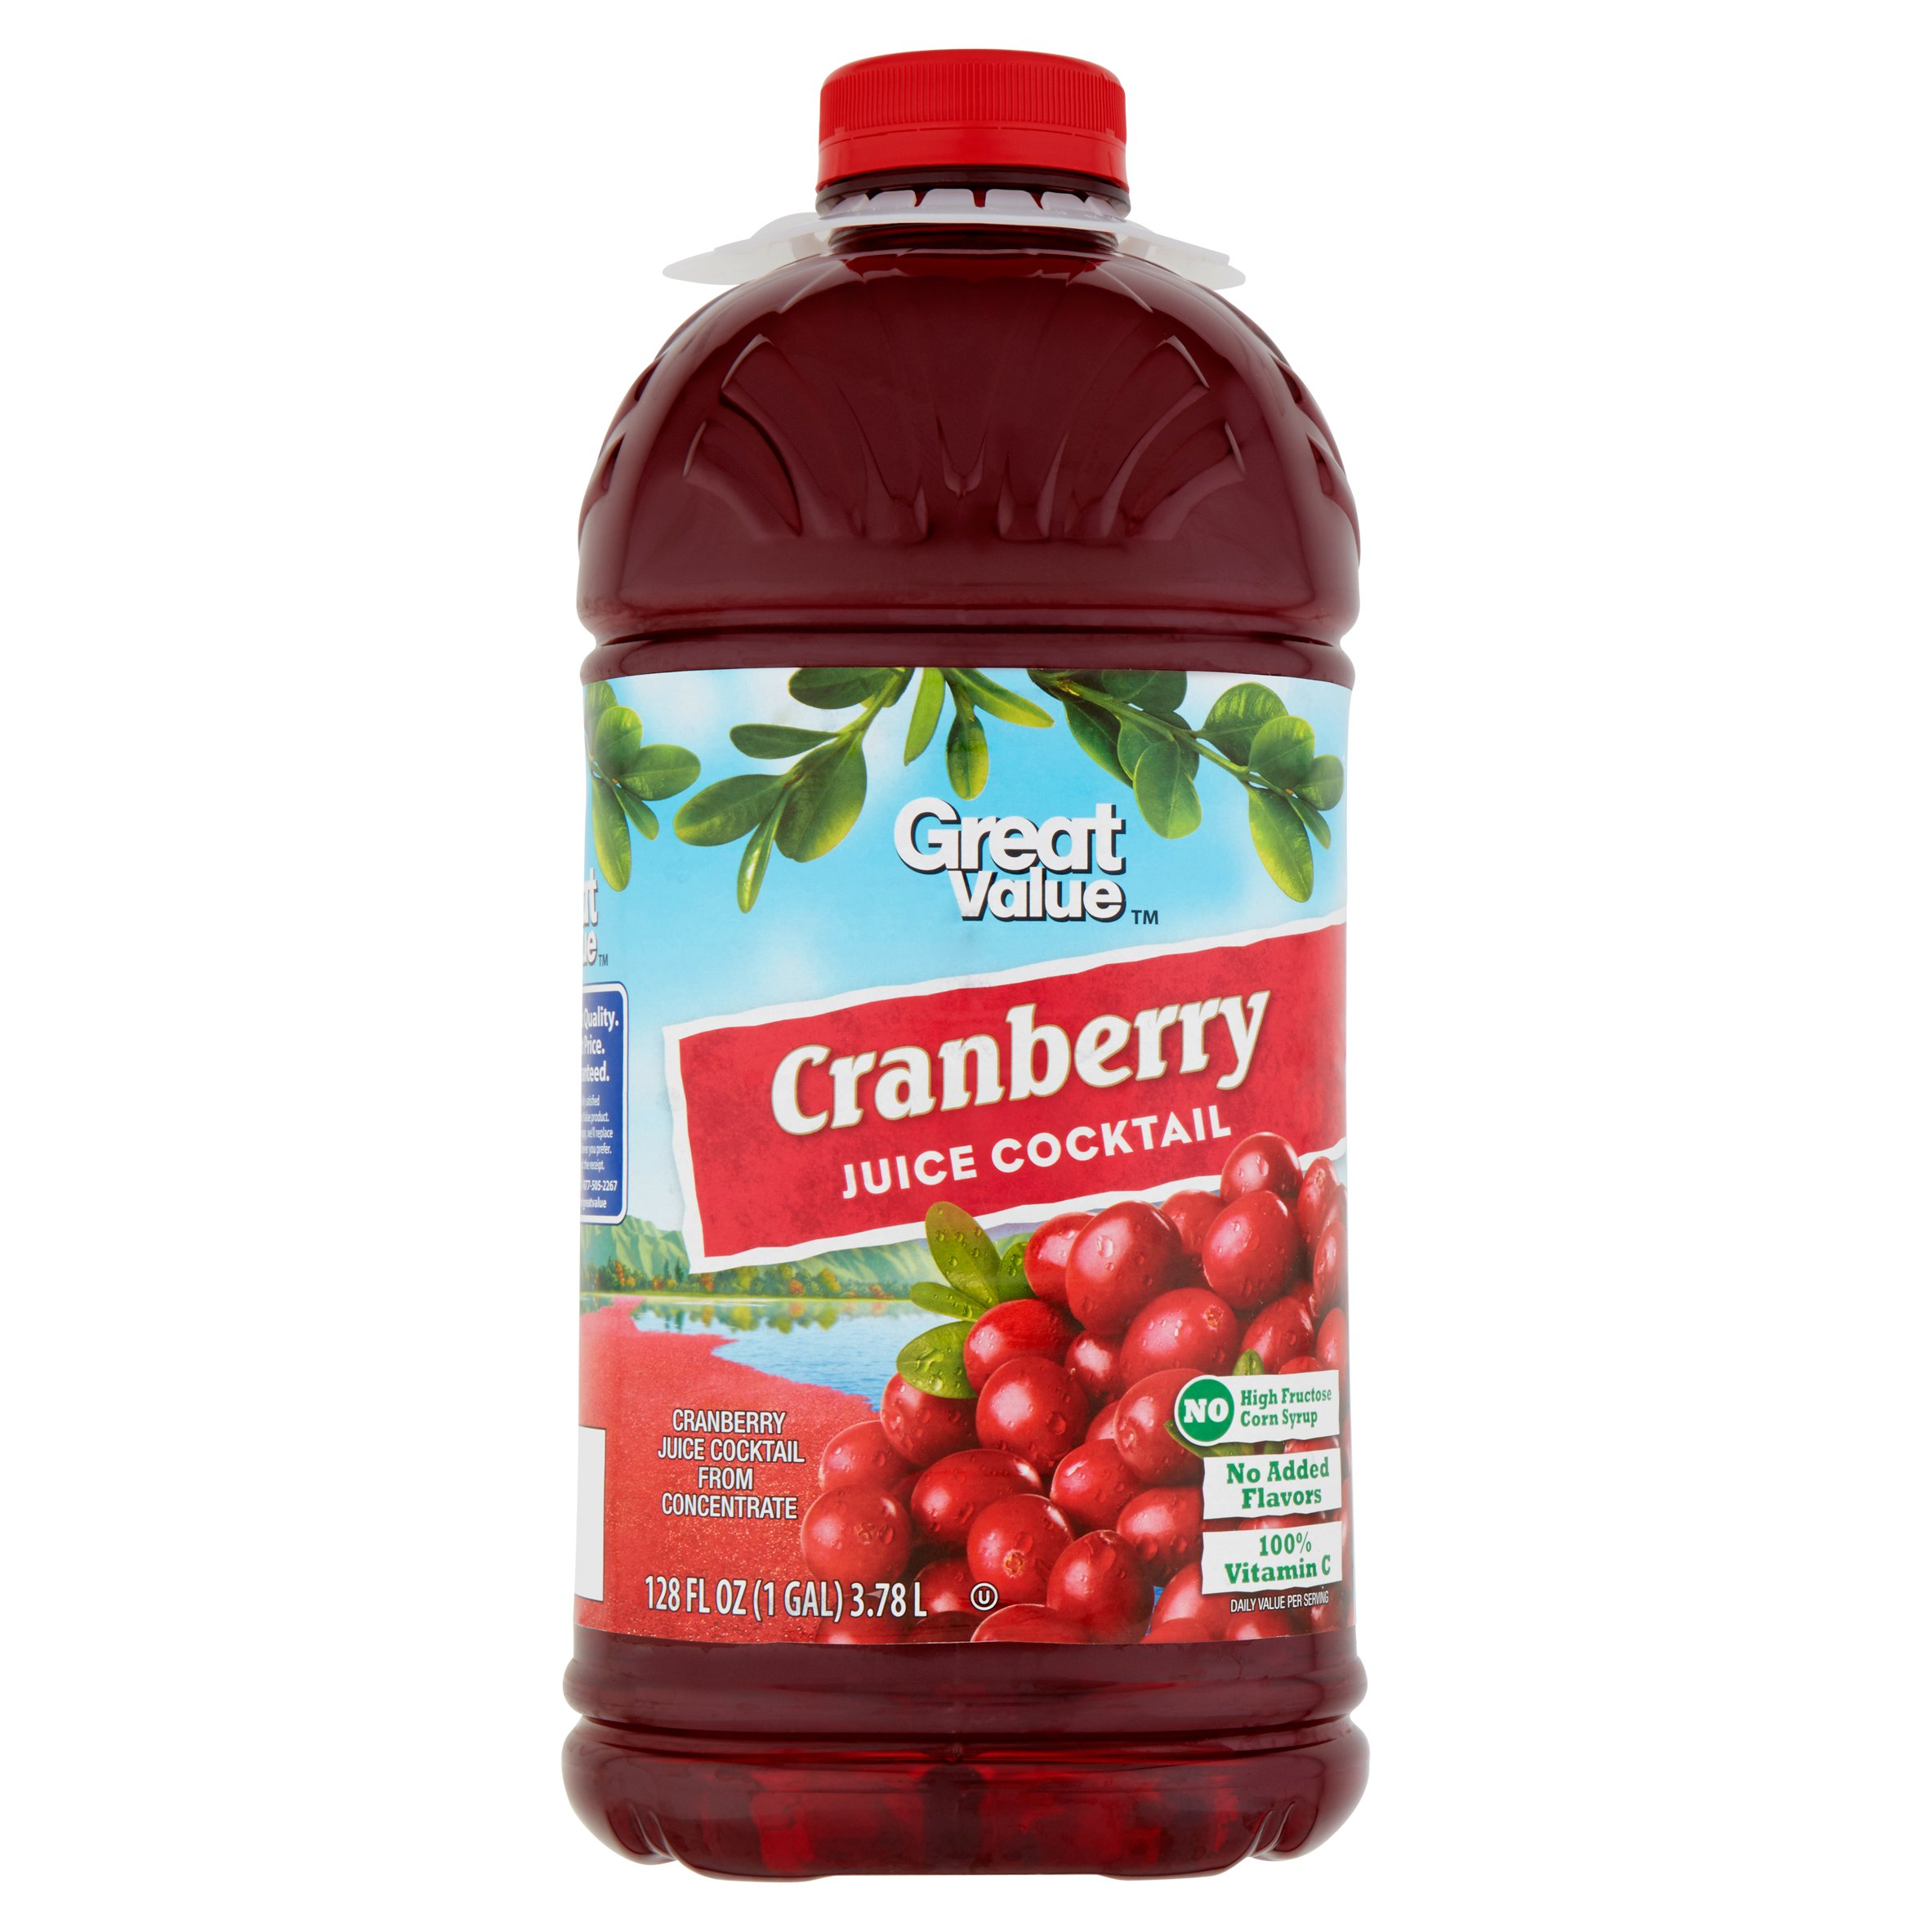 great value cranberry juice cocktail family size, 128 fl oz